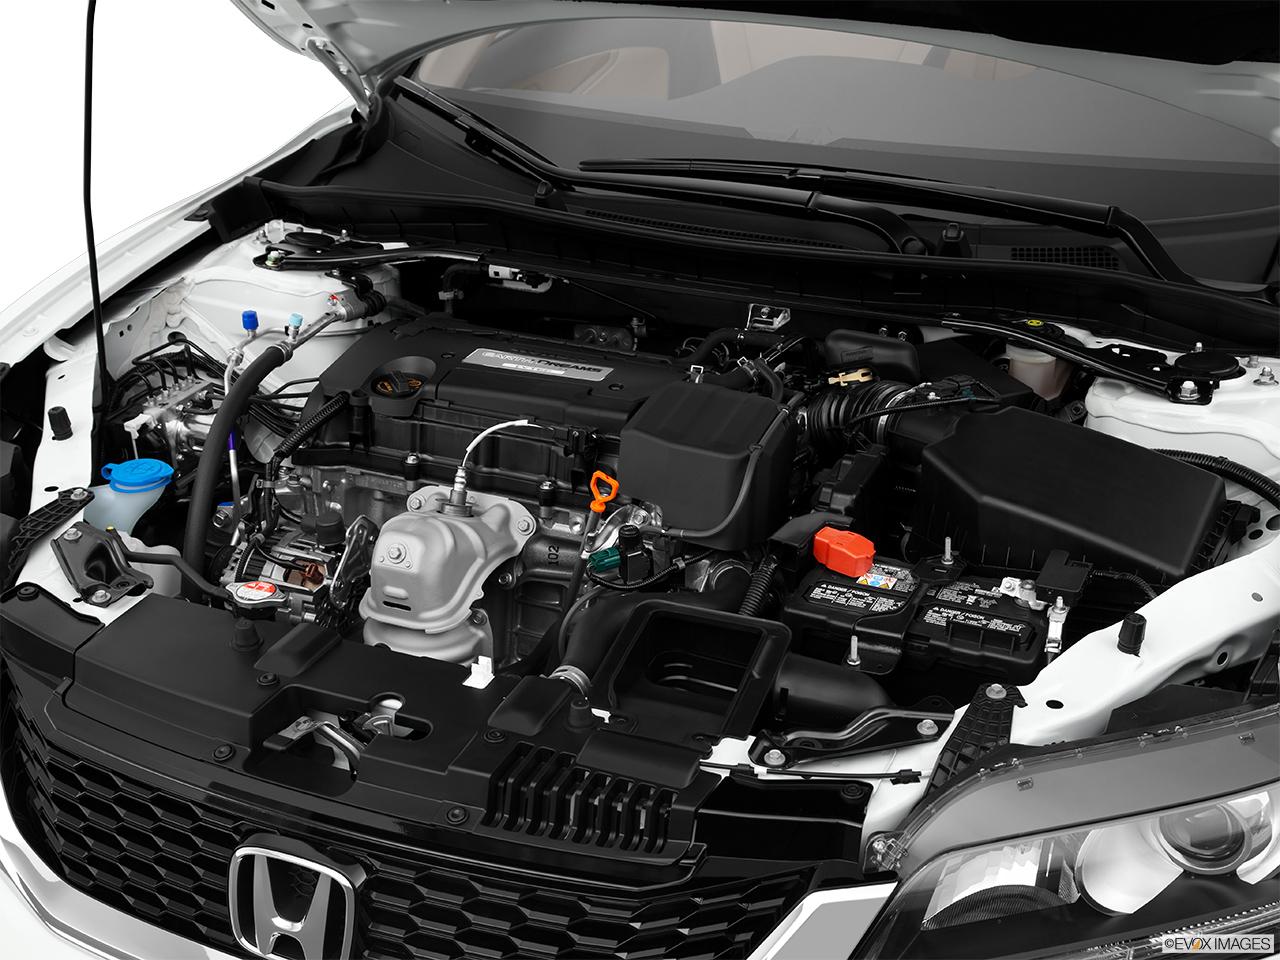 2015 Honda Accord Coupe V6 Auto Ex L W Navi Front Angle View